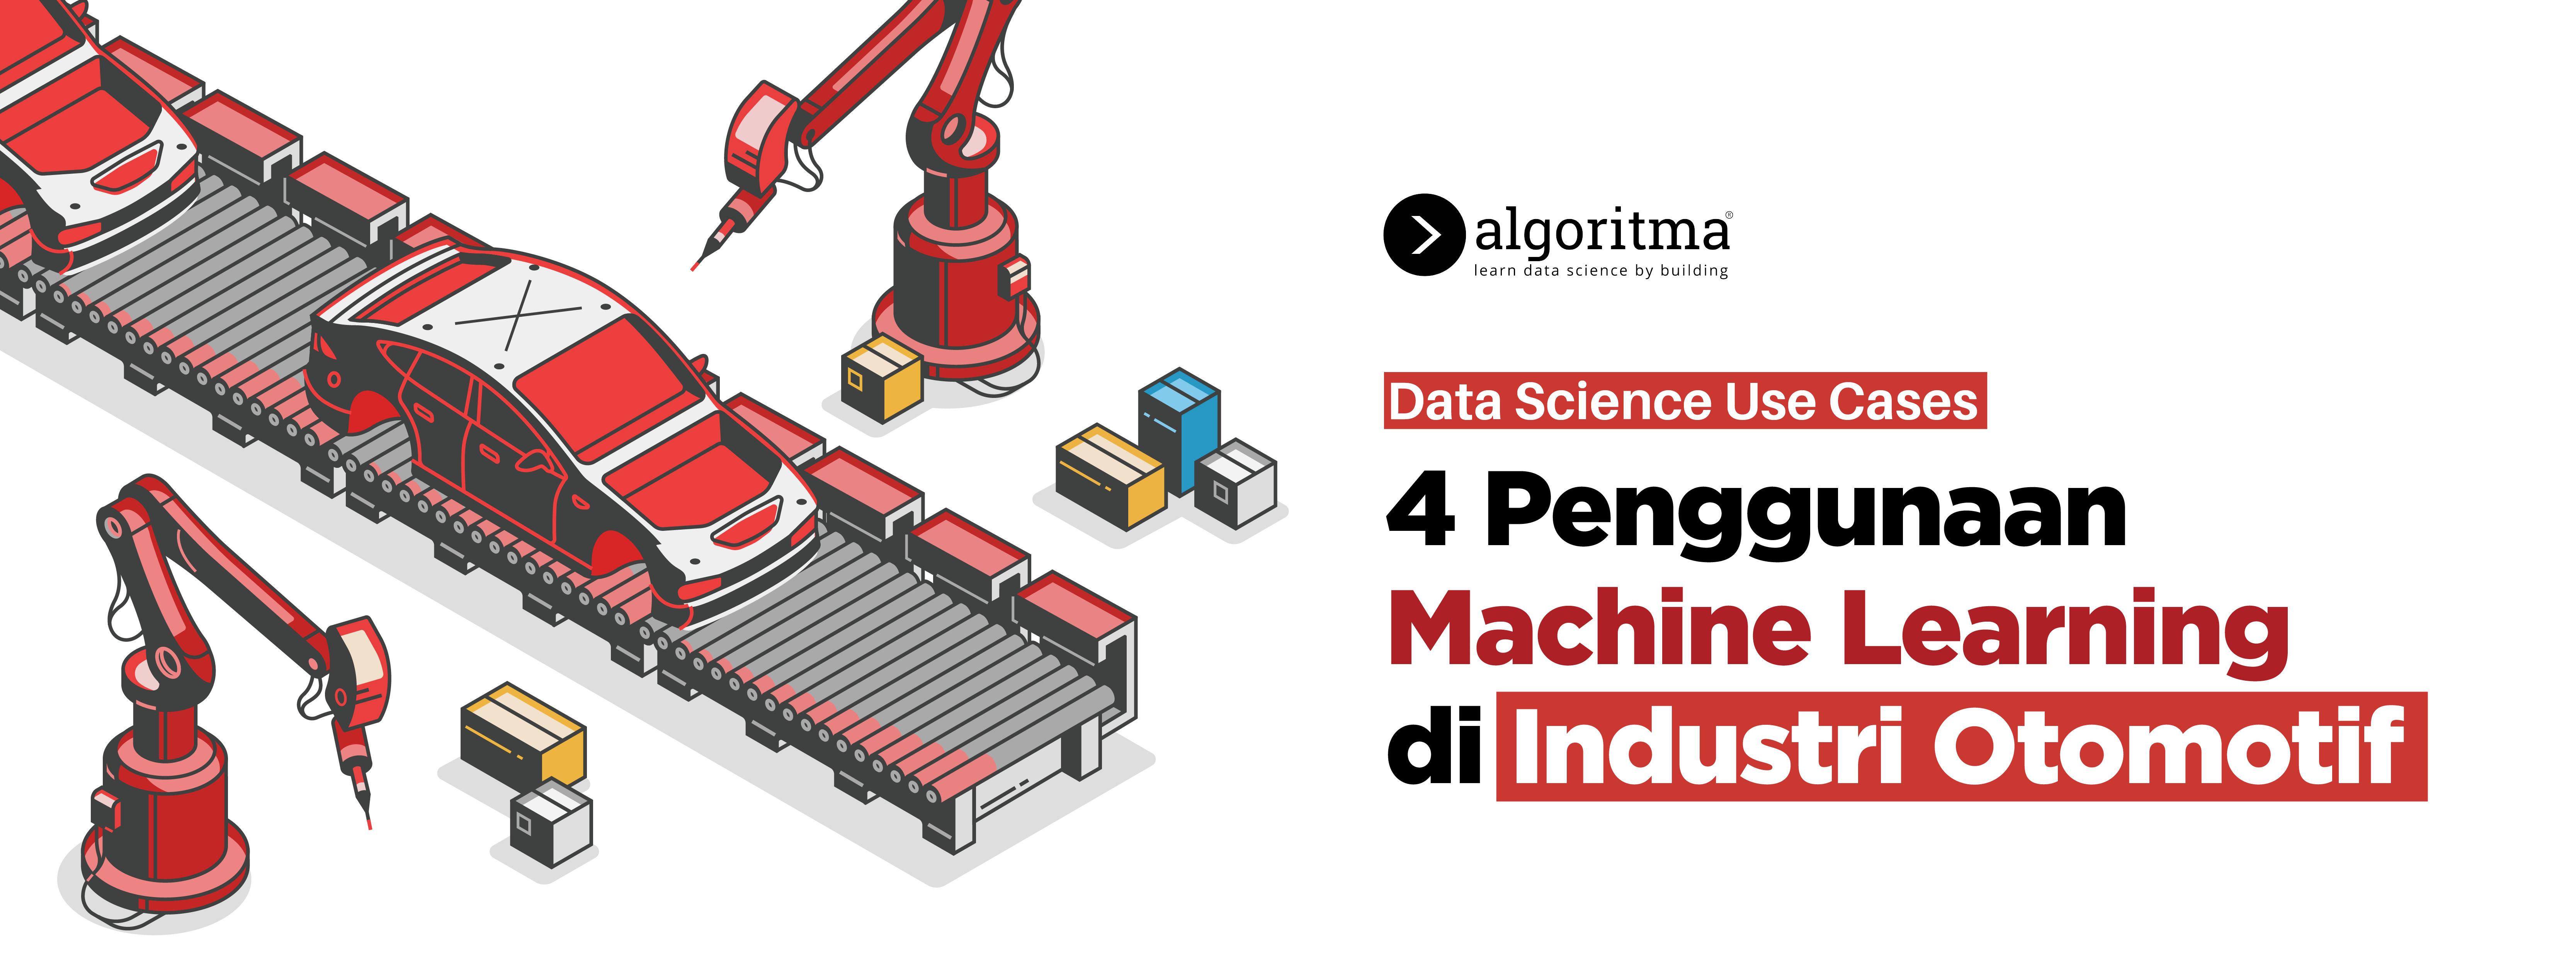 4 Penggunaan Machine Learning di Industri Otomotif